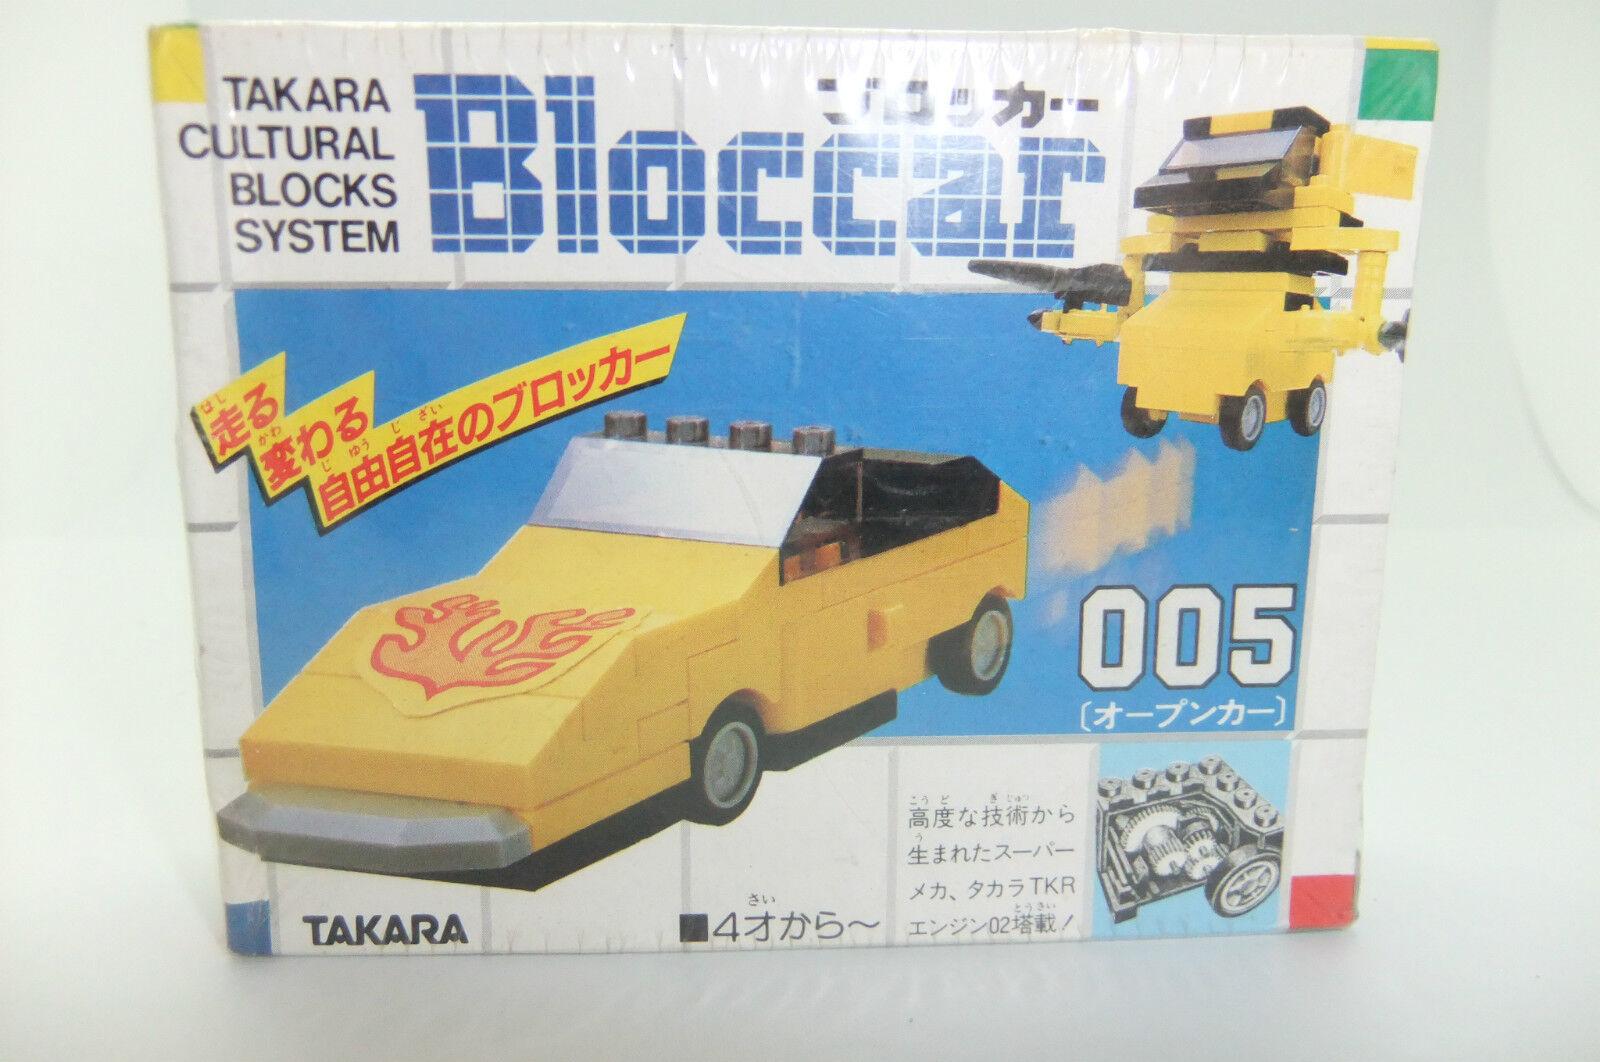 1980 TRANSFORMERS TAKARA BLOCCAR 005 MISB LEGO STIL